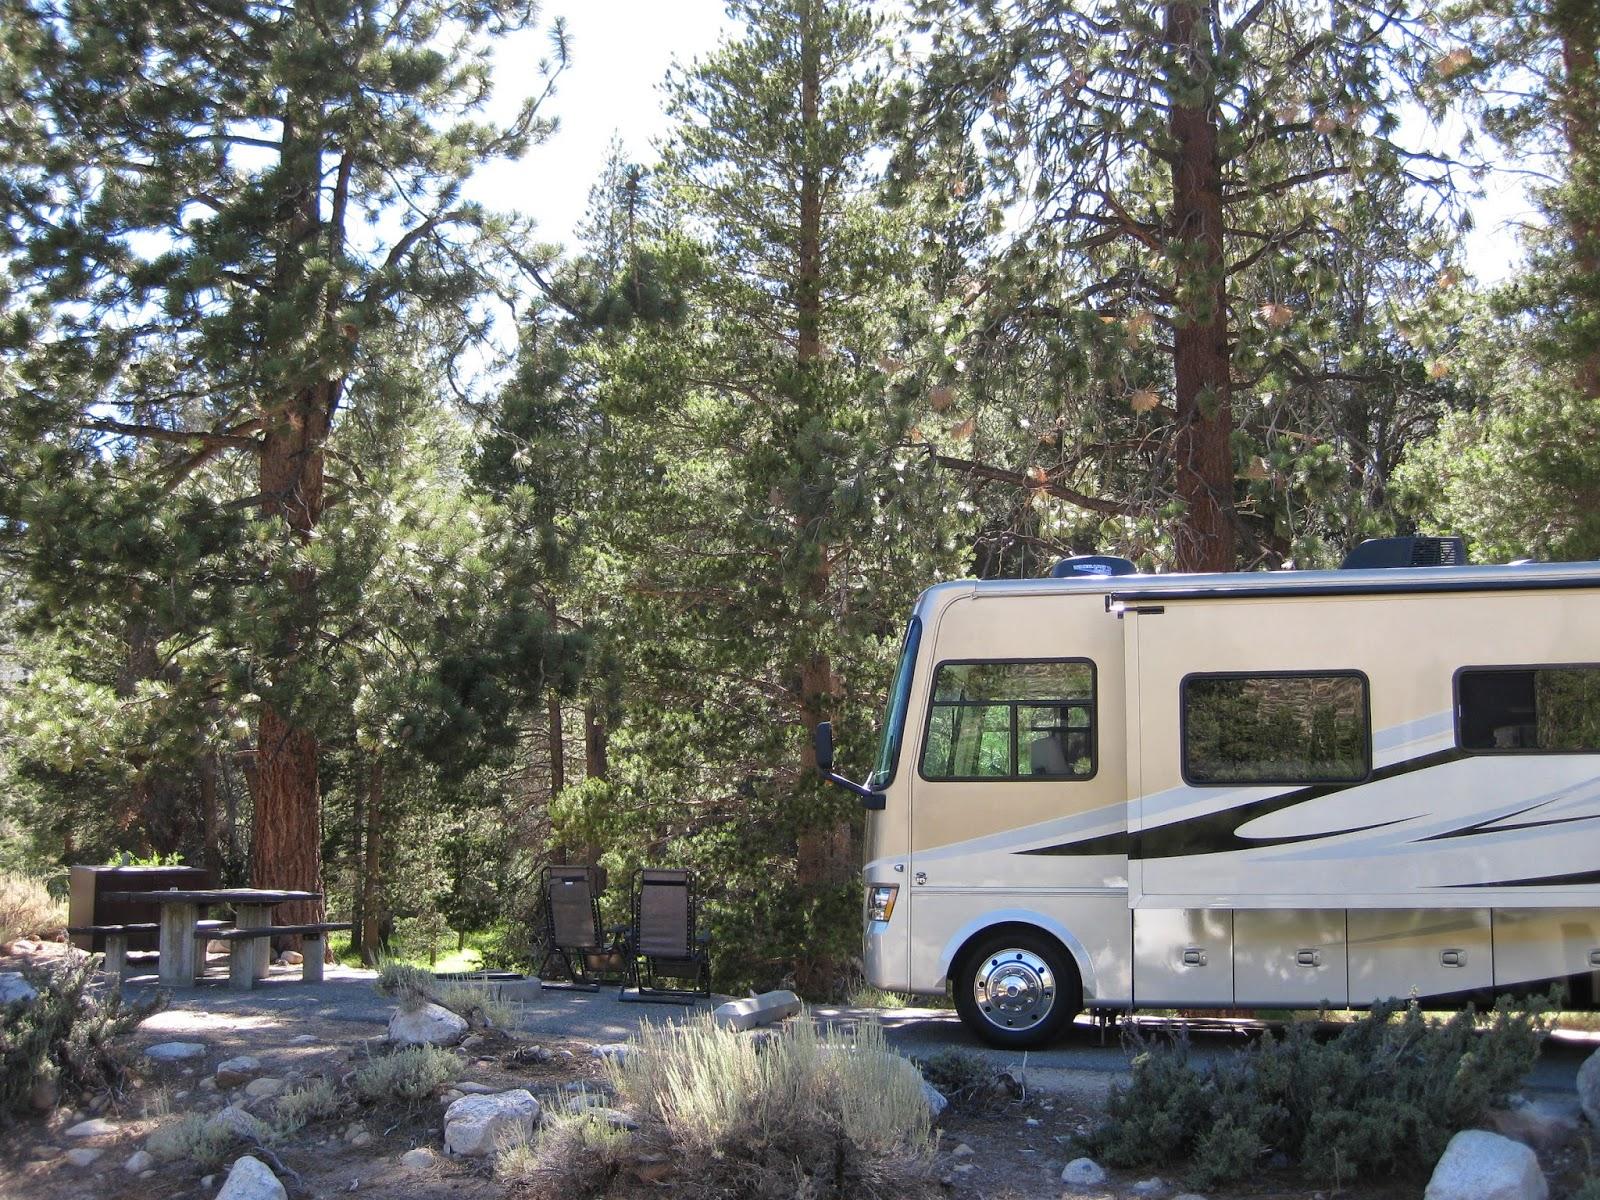 Campgroundcrazy Robinson Creek Campground Bridgeport